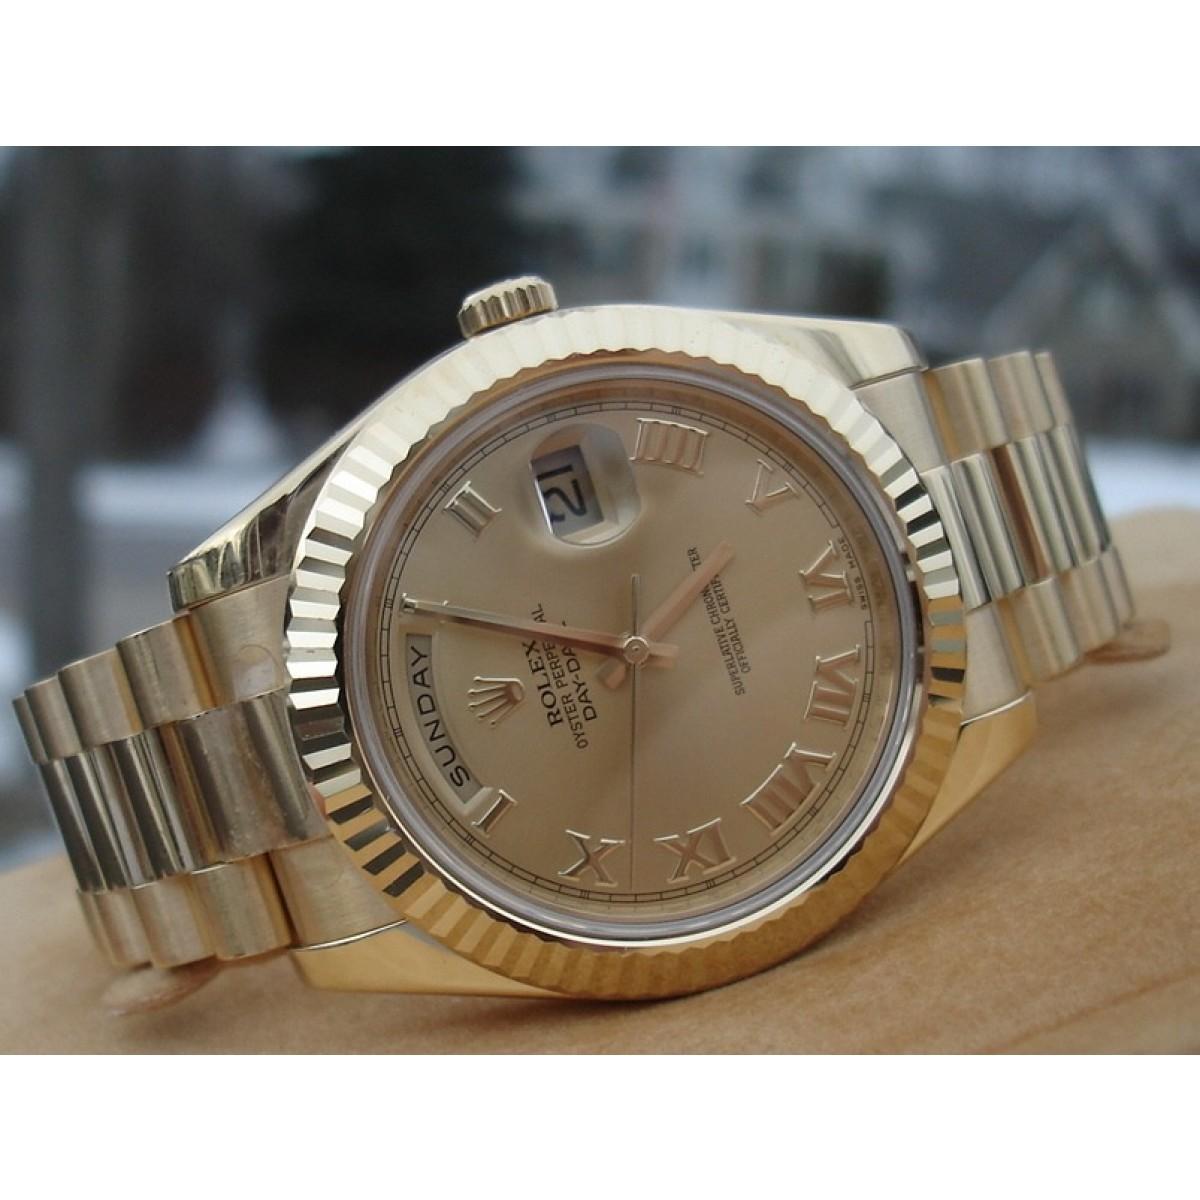 ae99578f066 Relógio Réplica Rolex Day Date Presidente